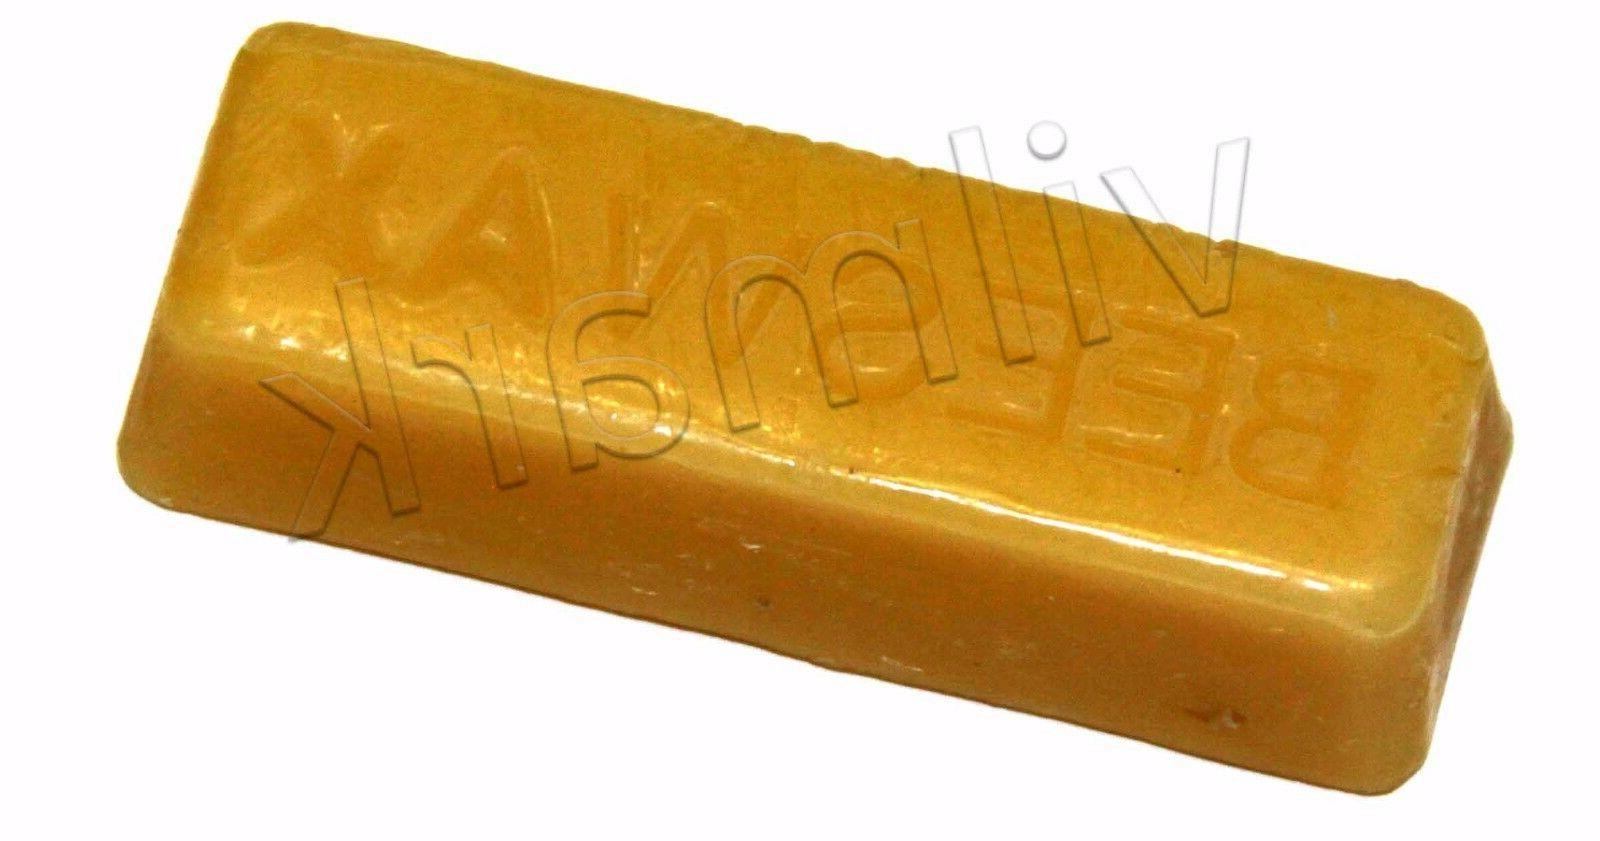 Beeswax 100% Bees Wax Cosmetic Grade A bars